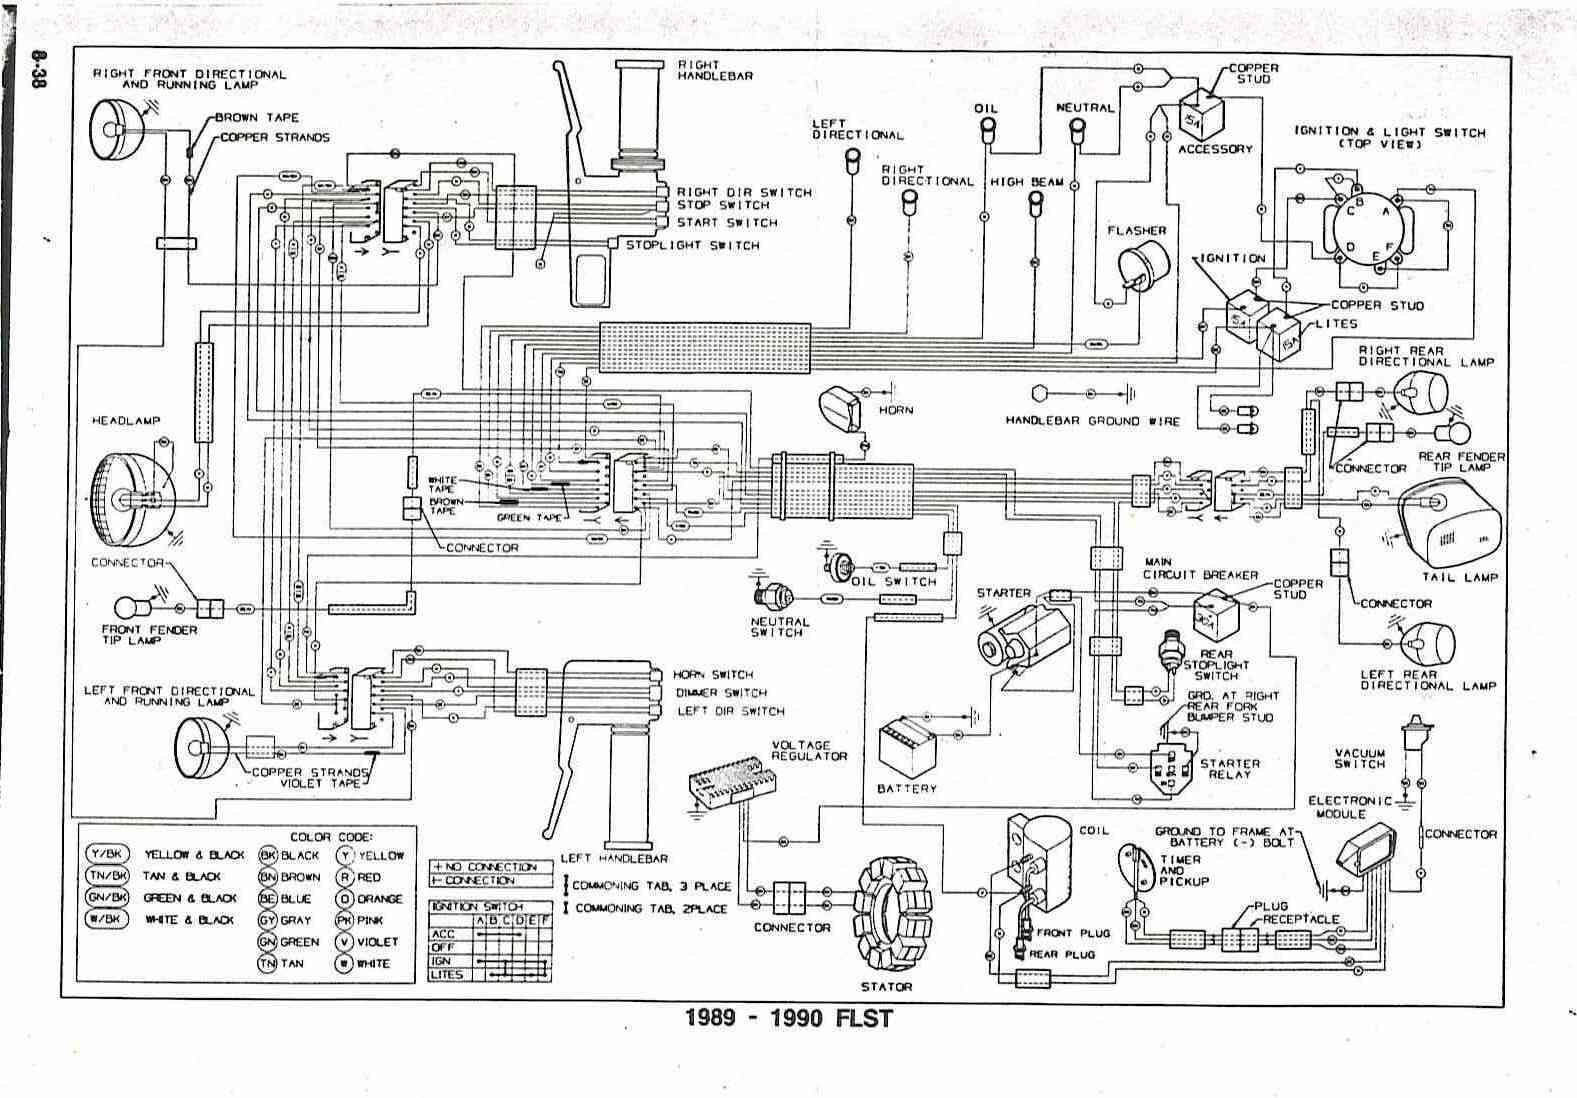 Wiring Diagrams For 2003 Fatboy Schematic Diagrams Harley-Davidson Wiring  Schematic Wiring Diagrams For 2003 Fatboy